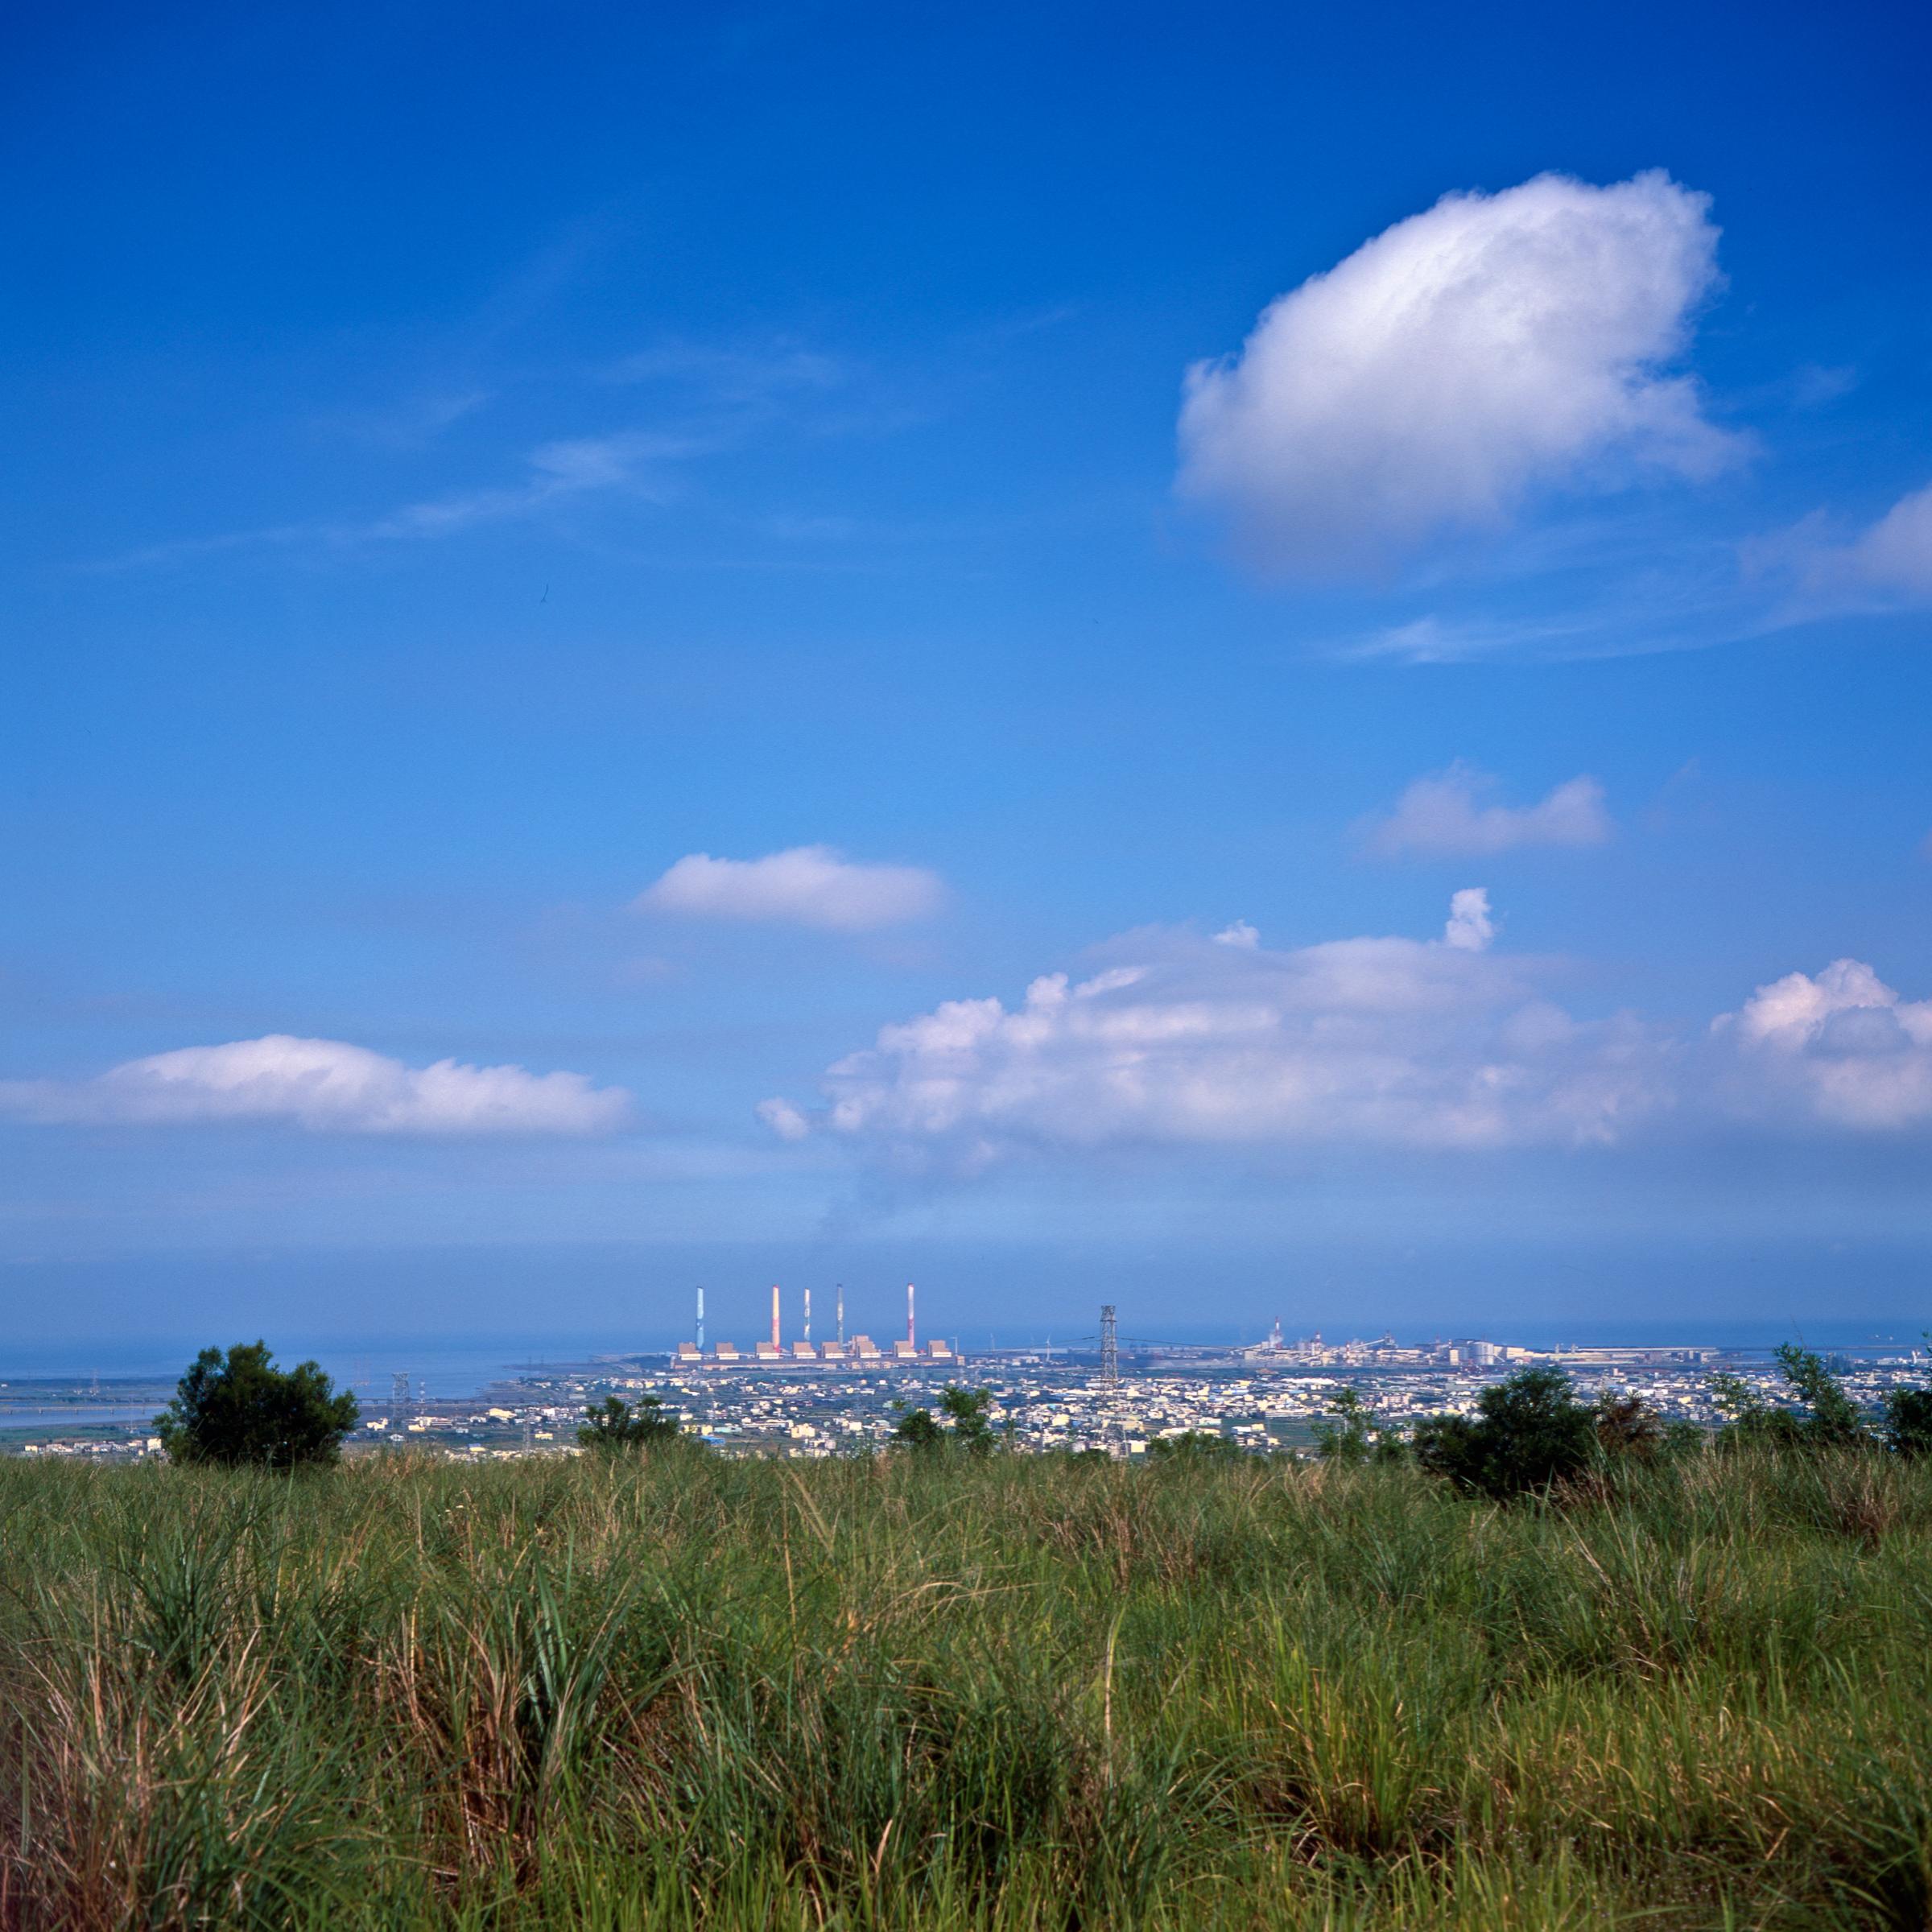 File:Looking west over the coastal plain at Longjing from Dadu Plateau.jpg